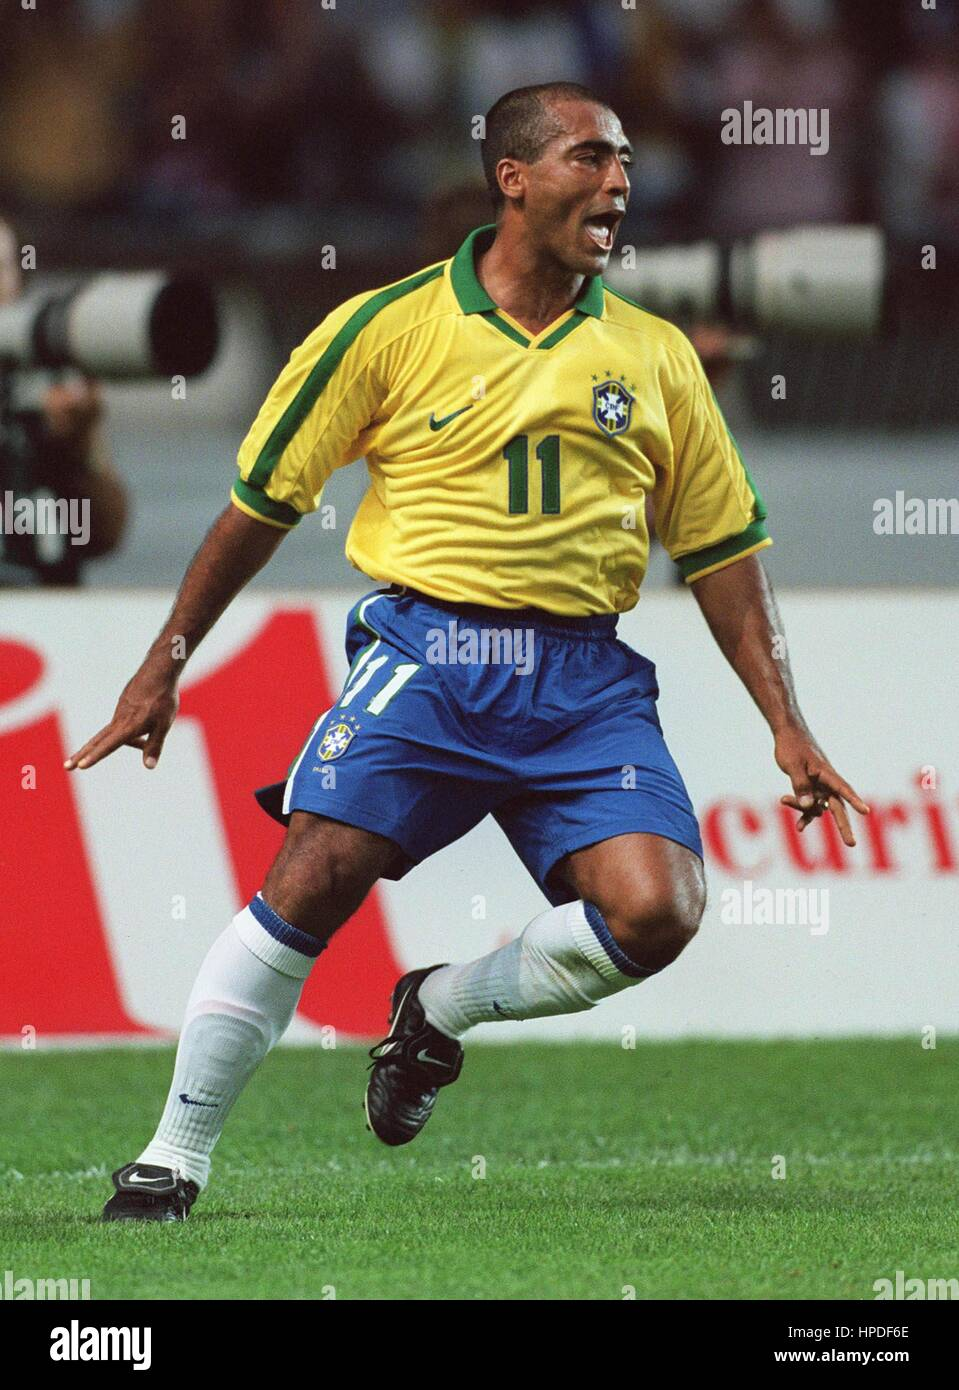 ROMARIO BRAZIL & FLAMENGO 13 June 1997 Stock Royalty Free